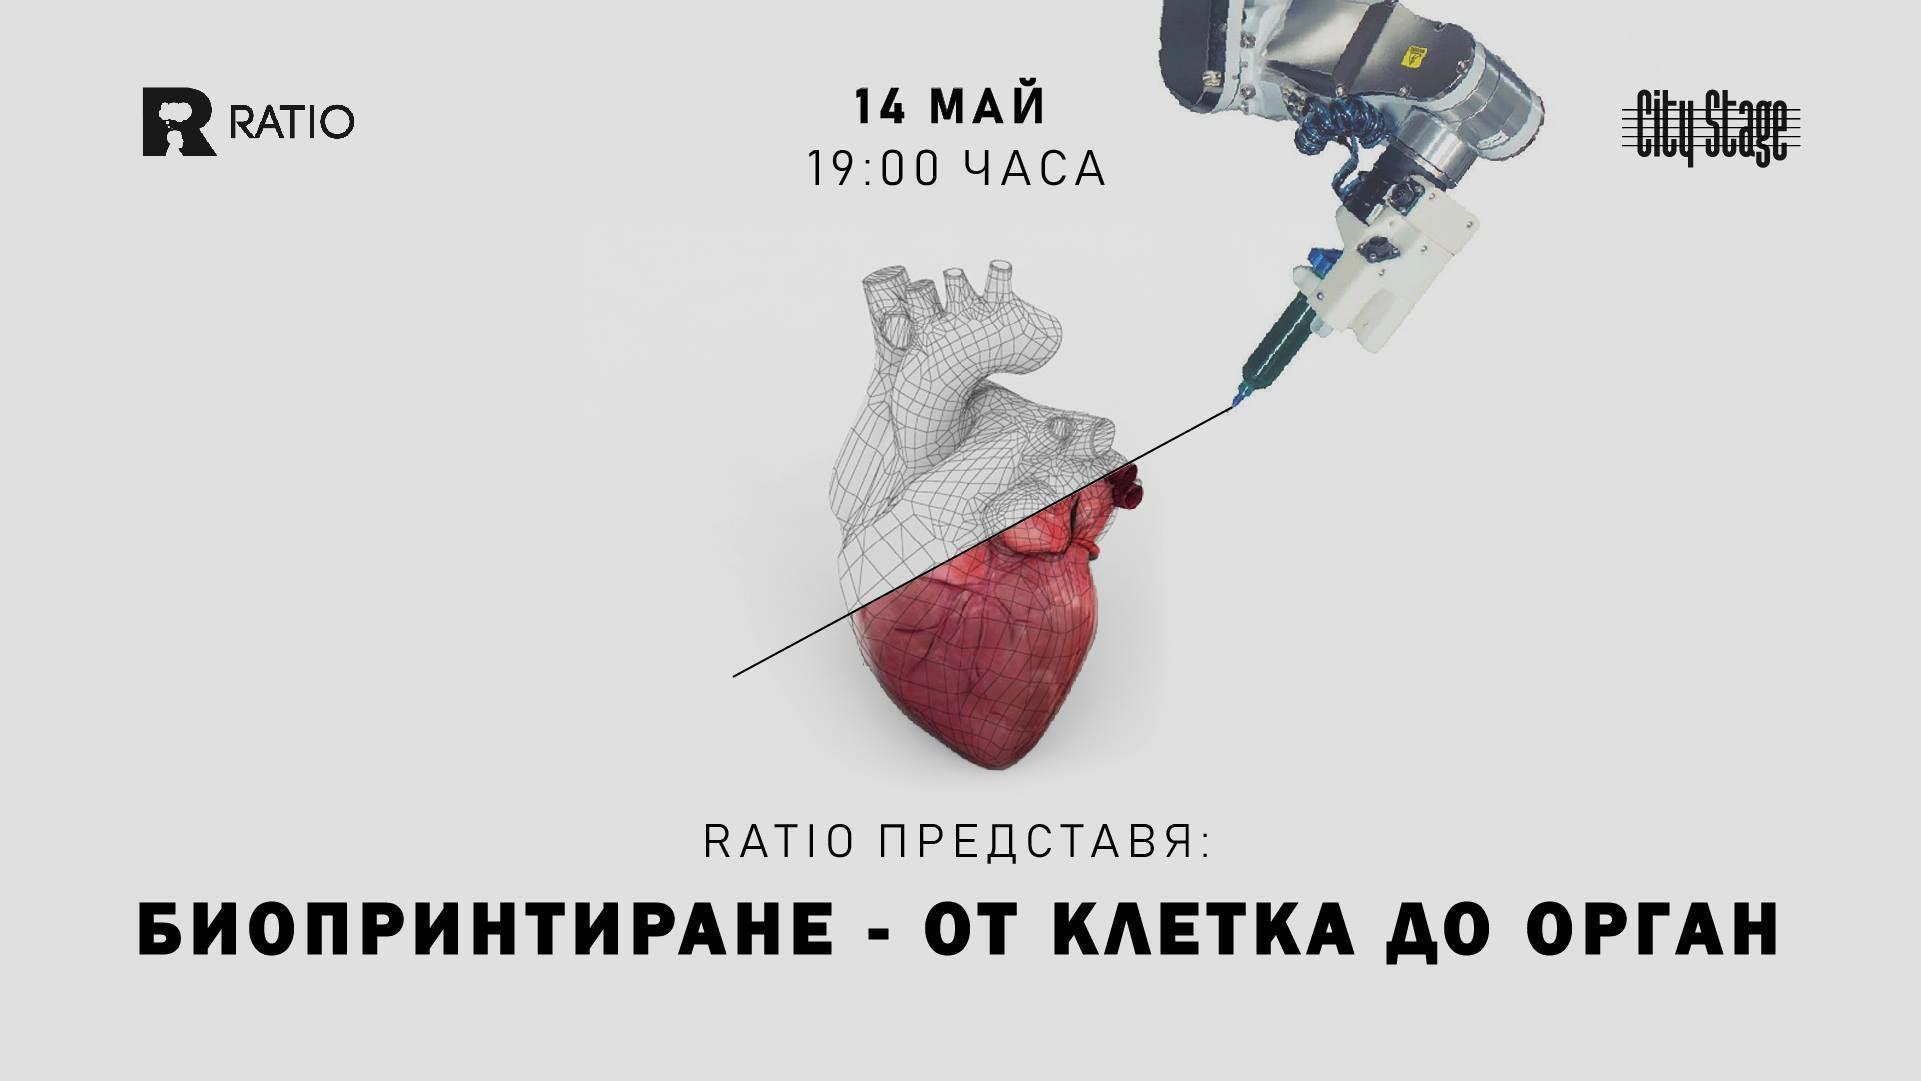 14 май 2019 г. 19:00 ч. City Stage | Ratio представя: Биопринтиране - от клетка до орган